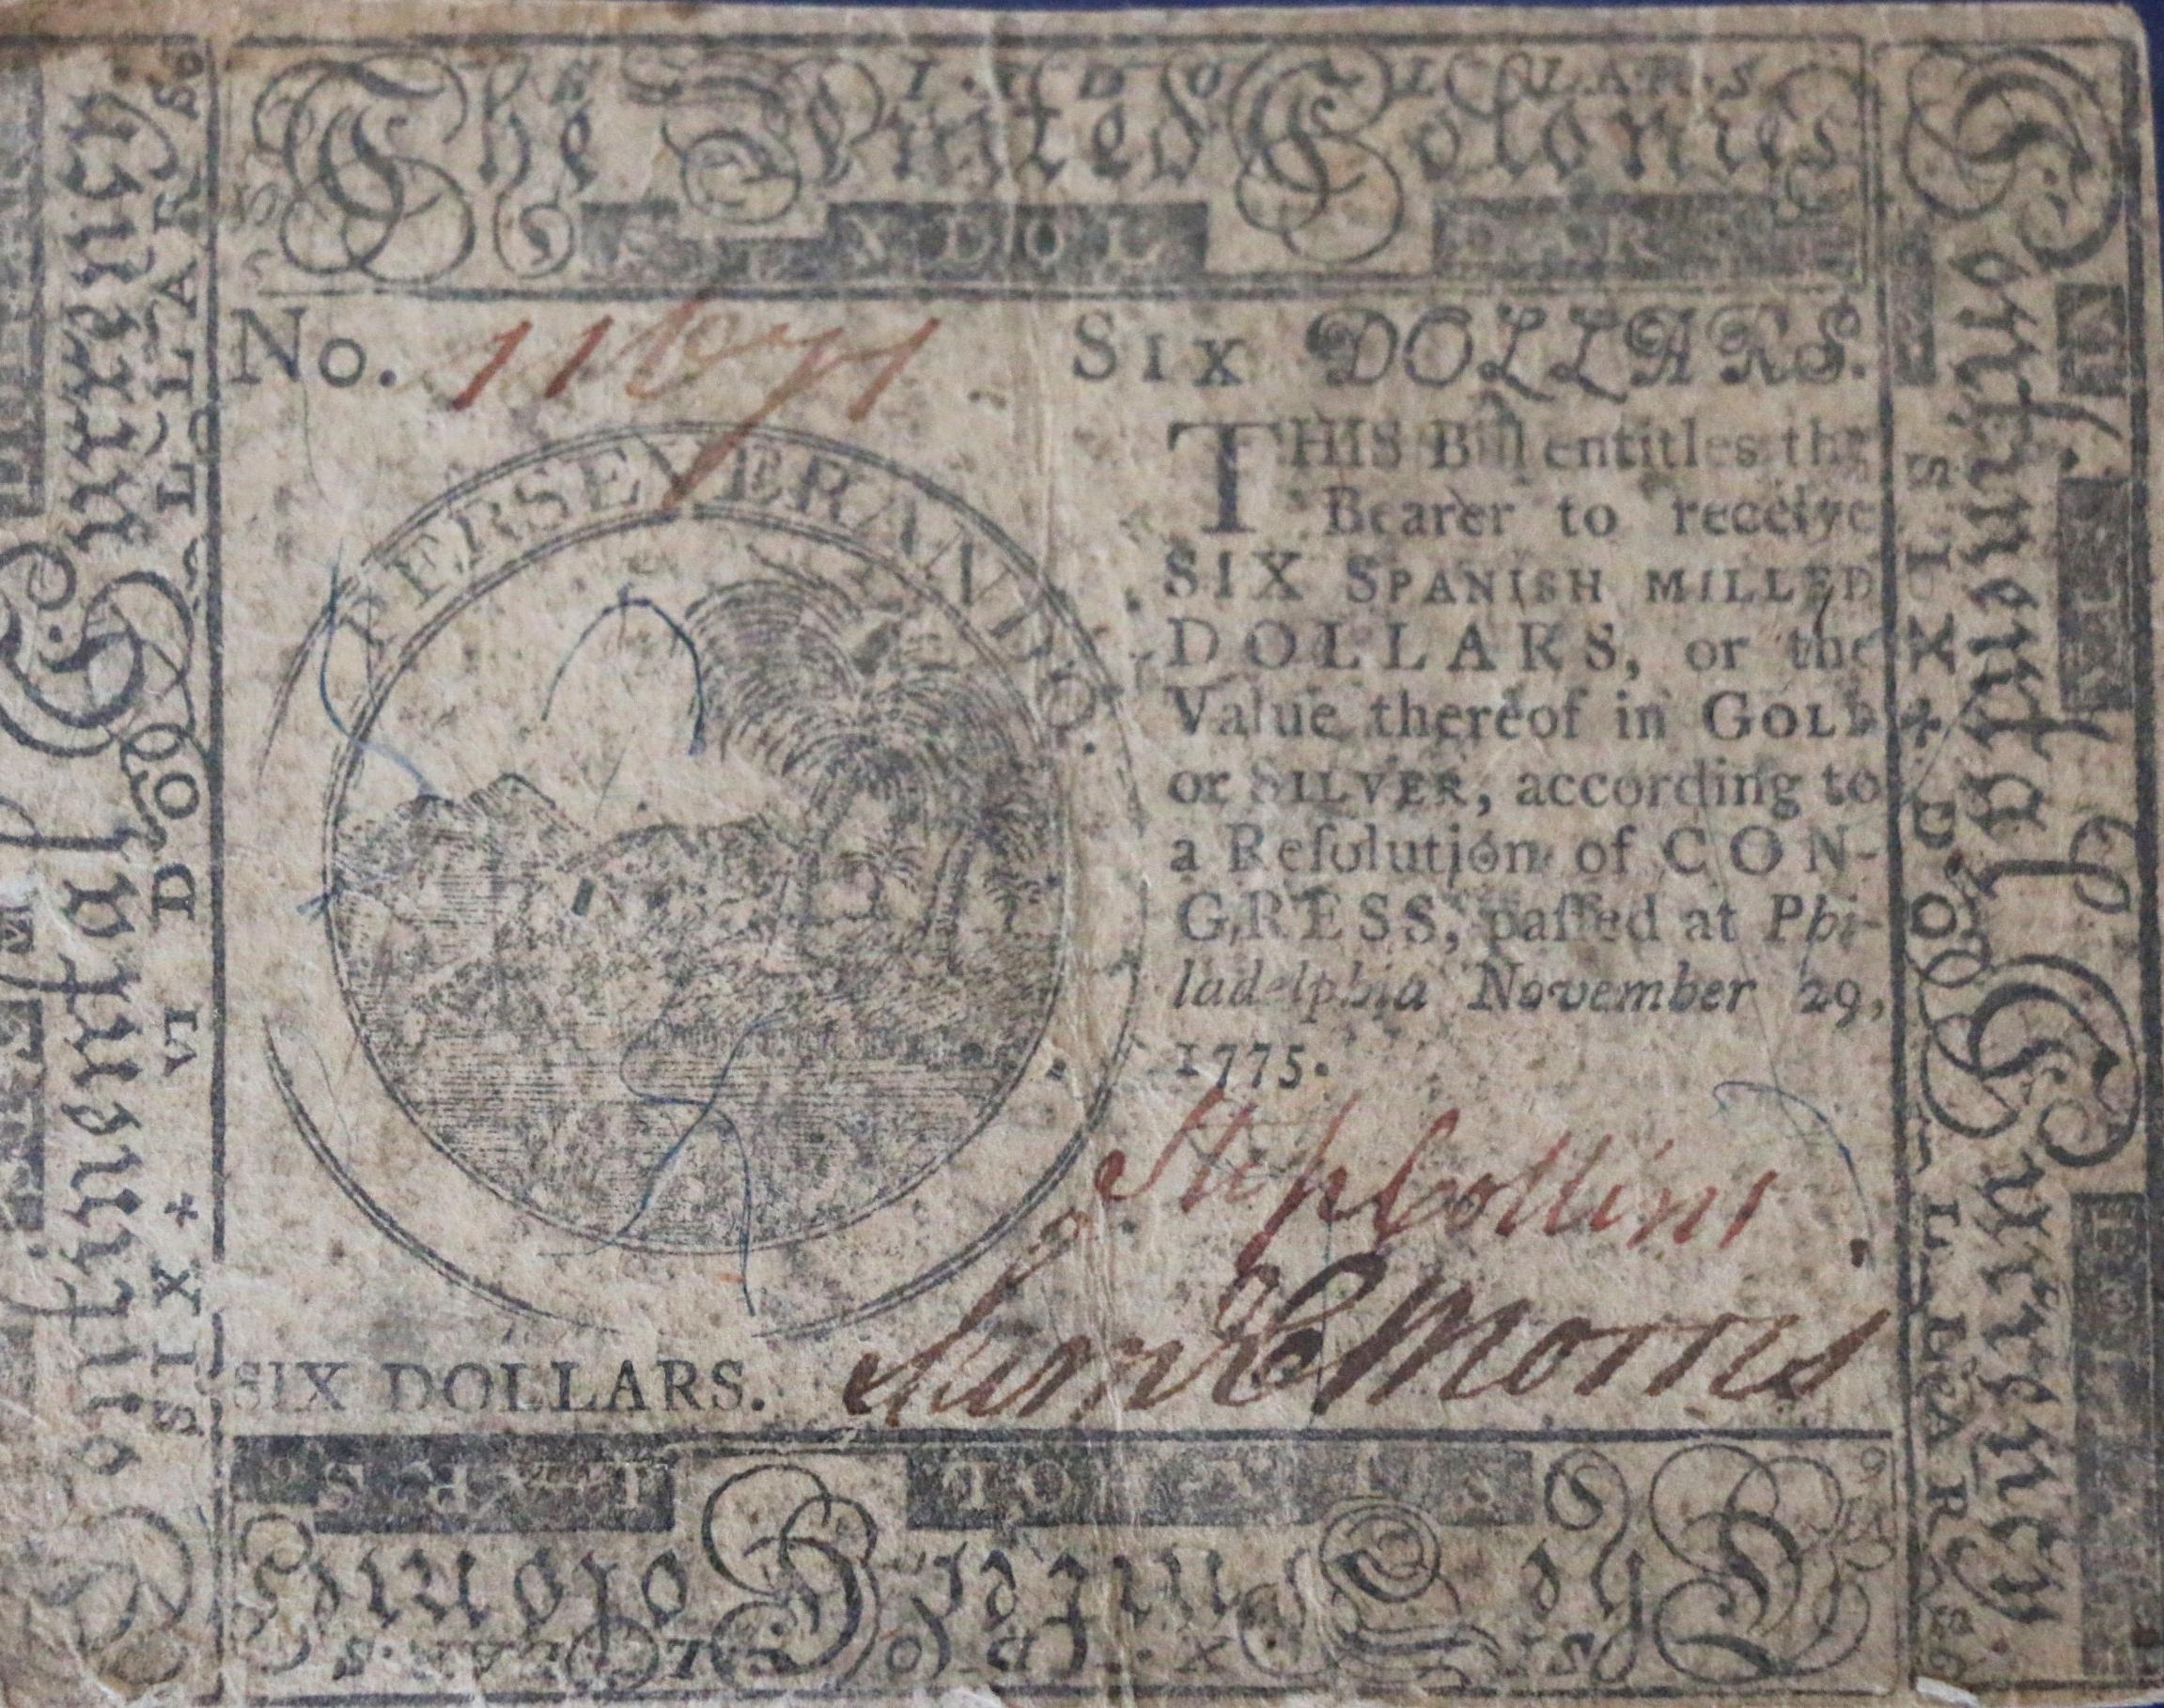 Six Dollars Continental Currency Nov. 29, 1775